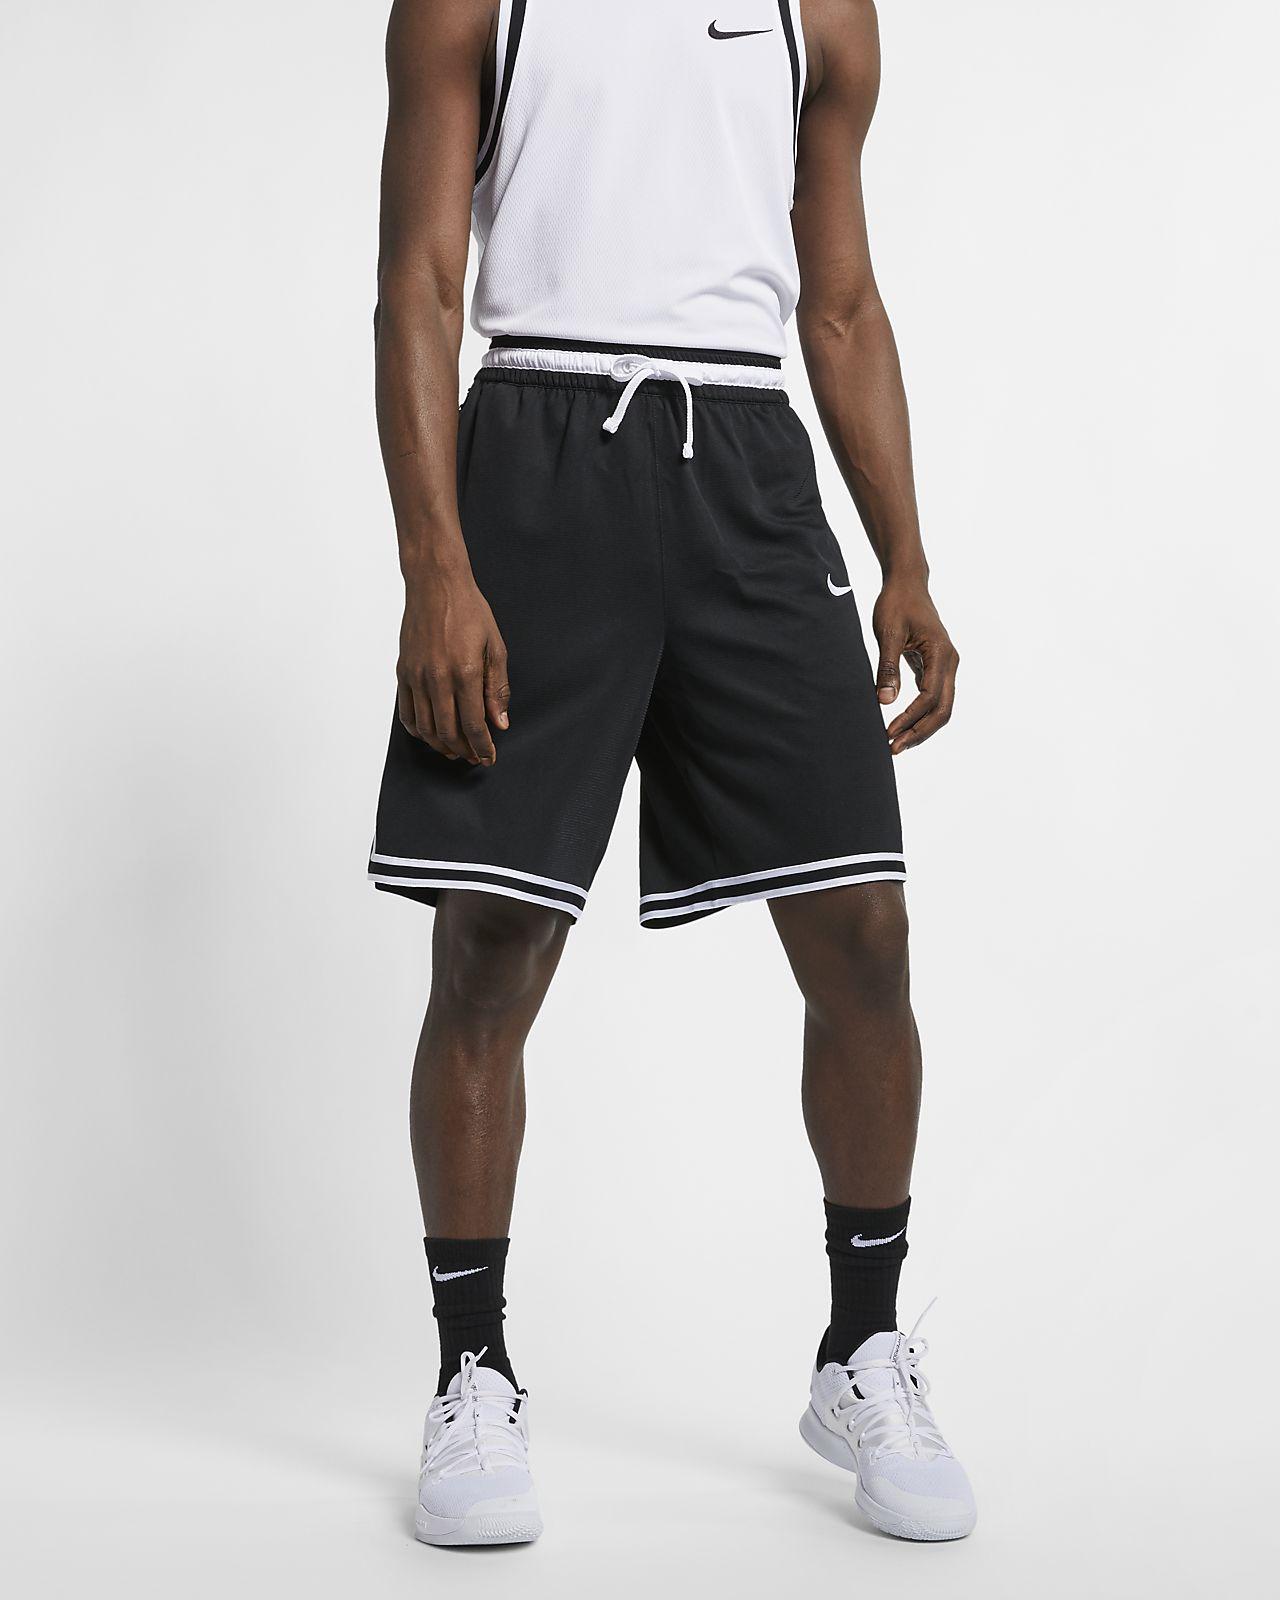 Shorts DNA FIT Men's Basketball Dri Nike PXTiZuOk